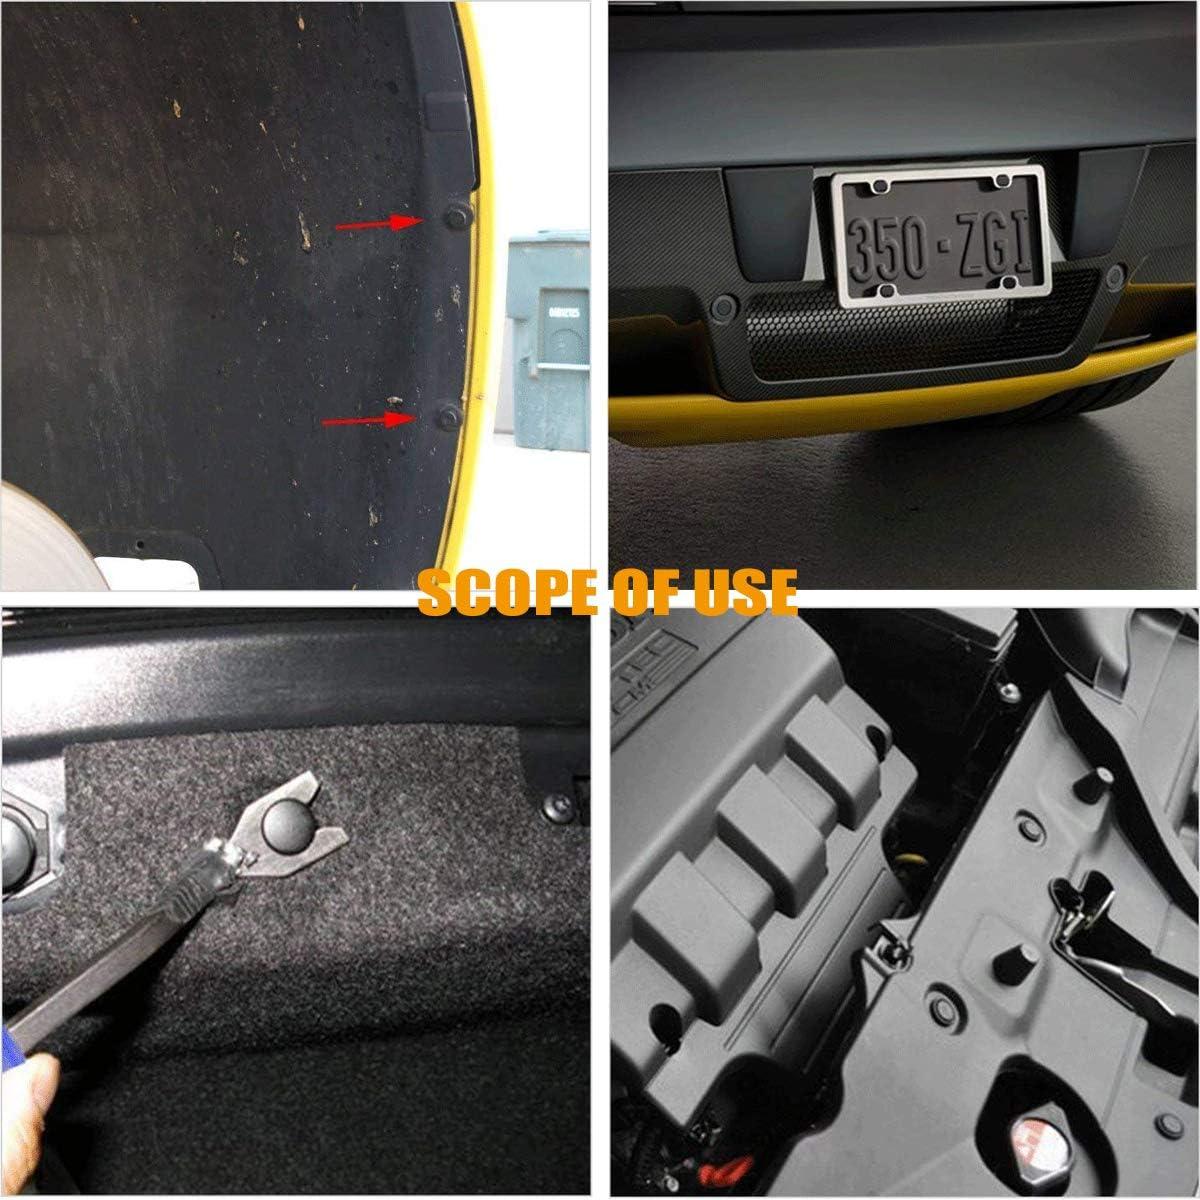 Dophee 50 Pcs 6mm Hole Car Push Type Plastic Rivet Trim Panel Fastener Clips for Toyota